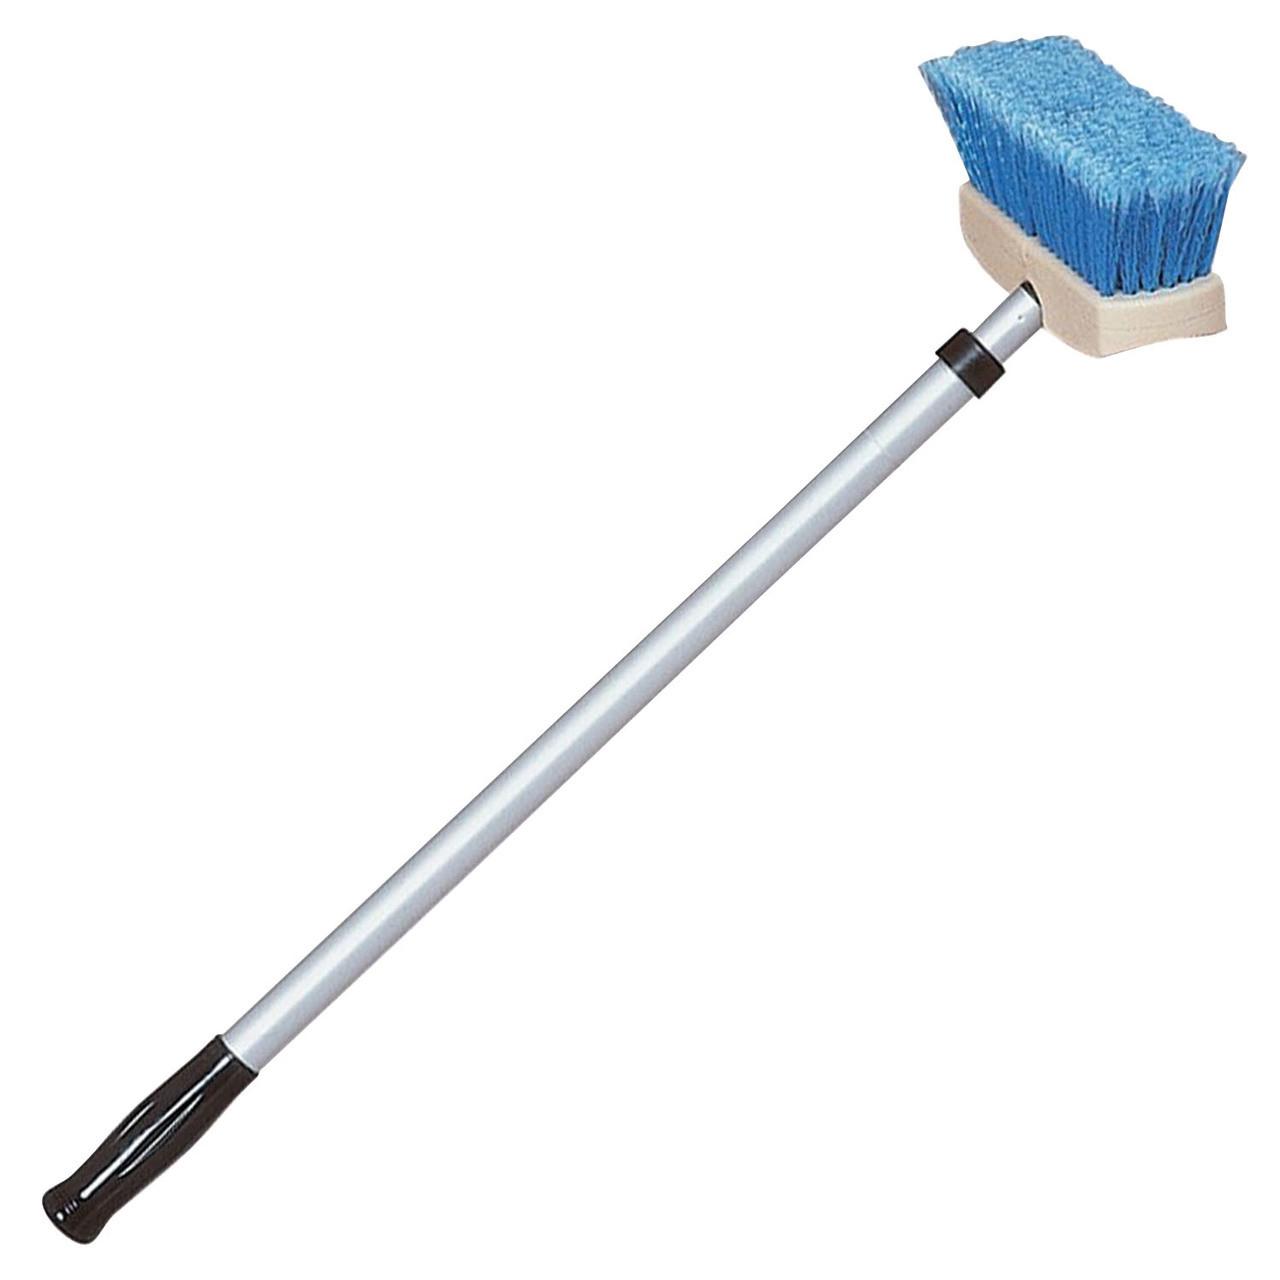 Starbrite Deck Brush Handle 40097